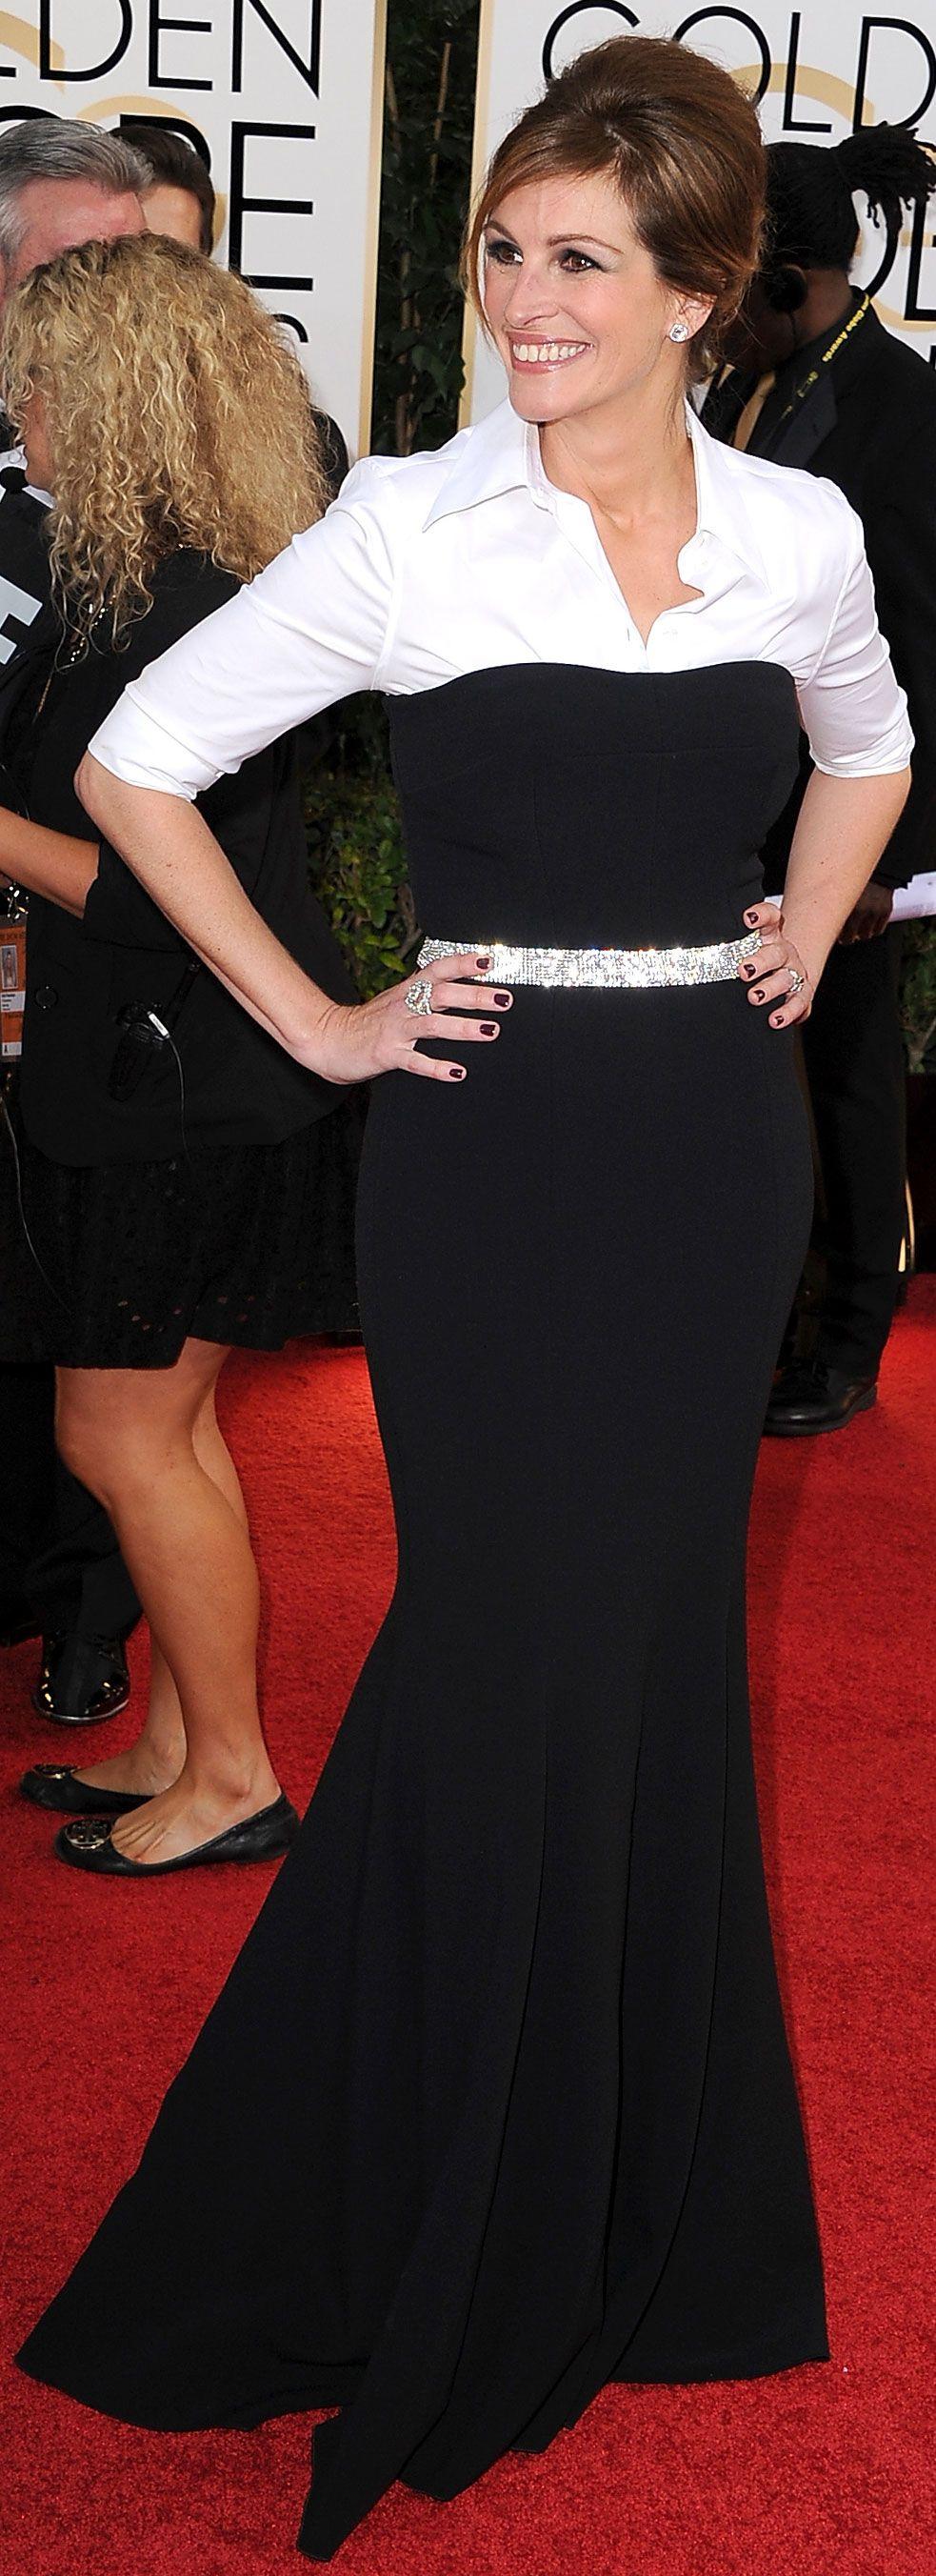 Is Julia Roberts S Layering Trick A Red Carpet Do Or Don T Julia Roberts Dresses Red Carpet Fashion [ 2704 x 983 Pixel ]